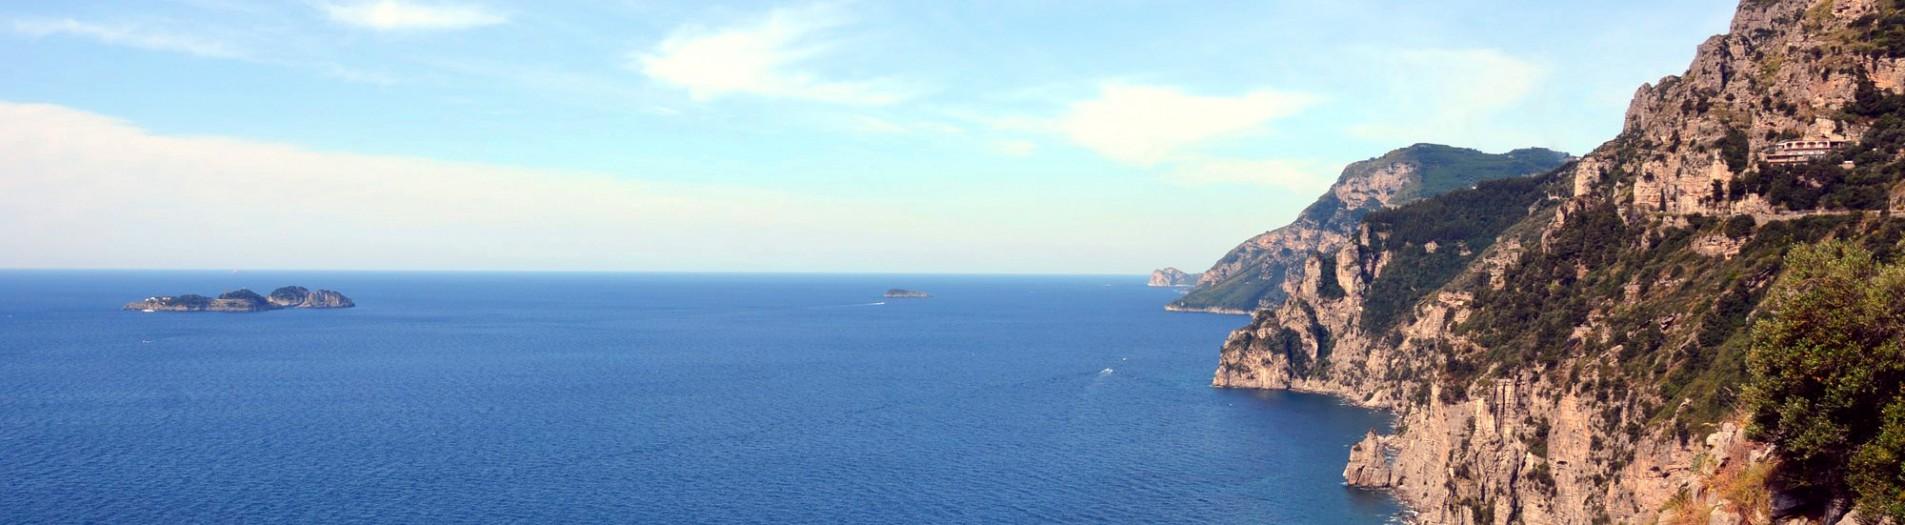 Along the Sorrento coast